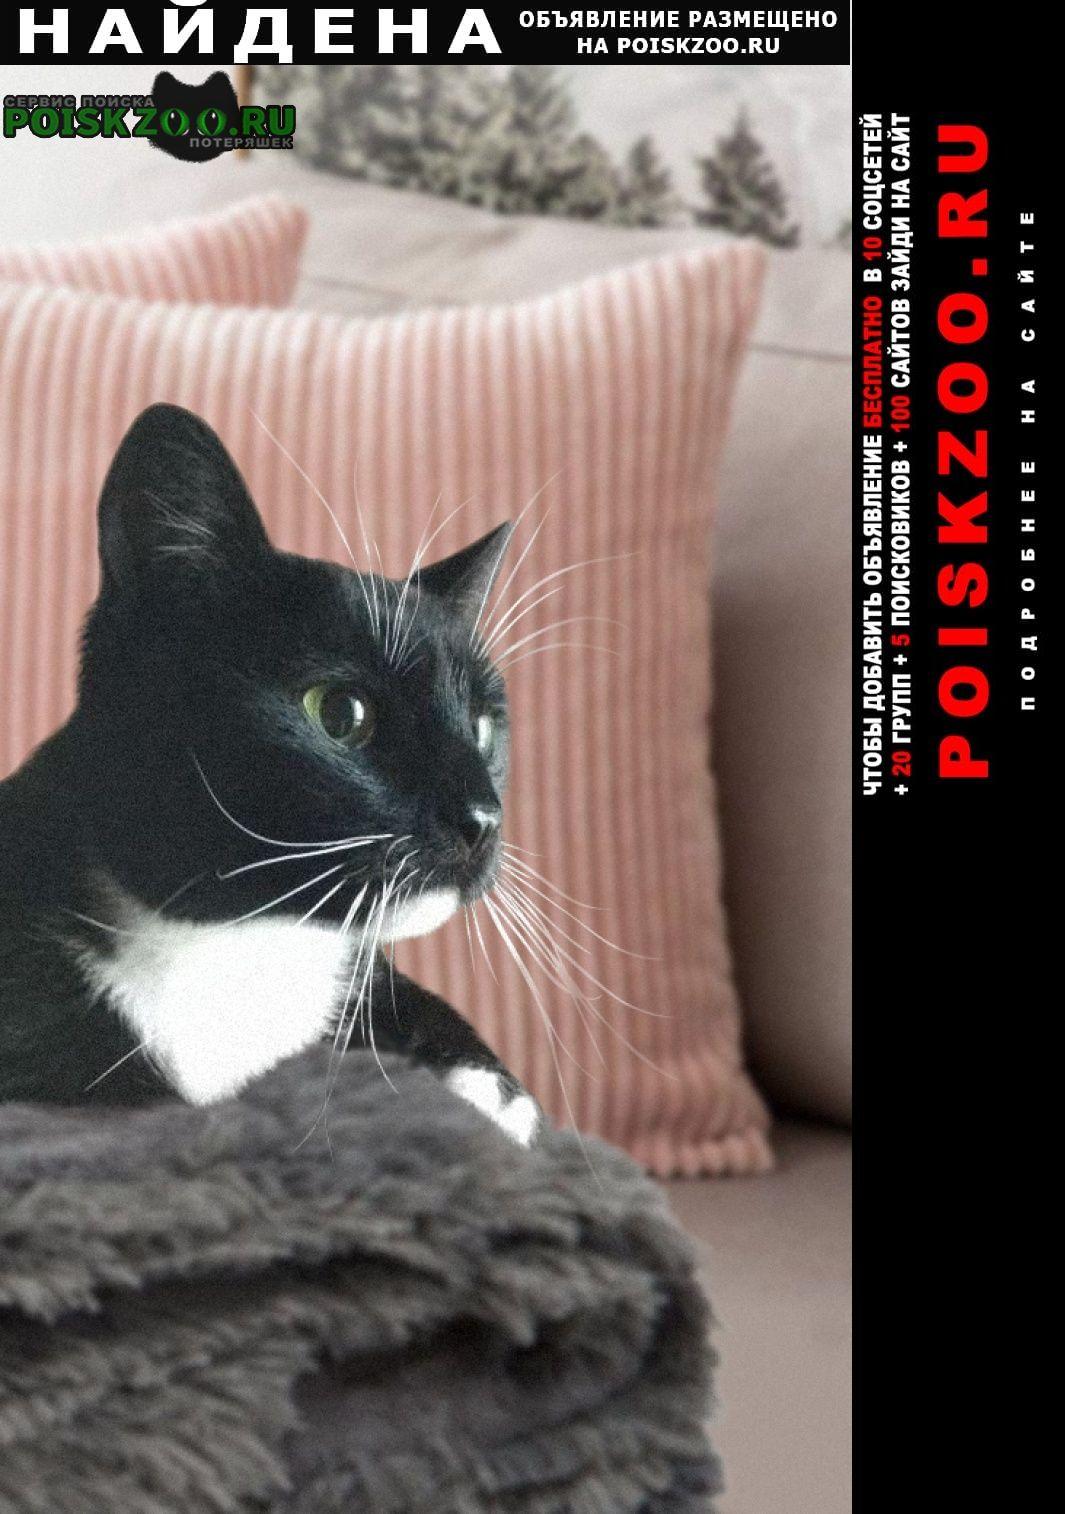 Найдена кошка стрелка ищет дом Белгород